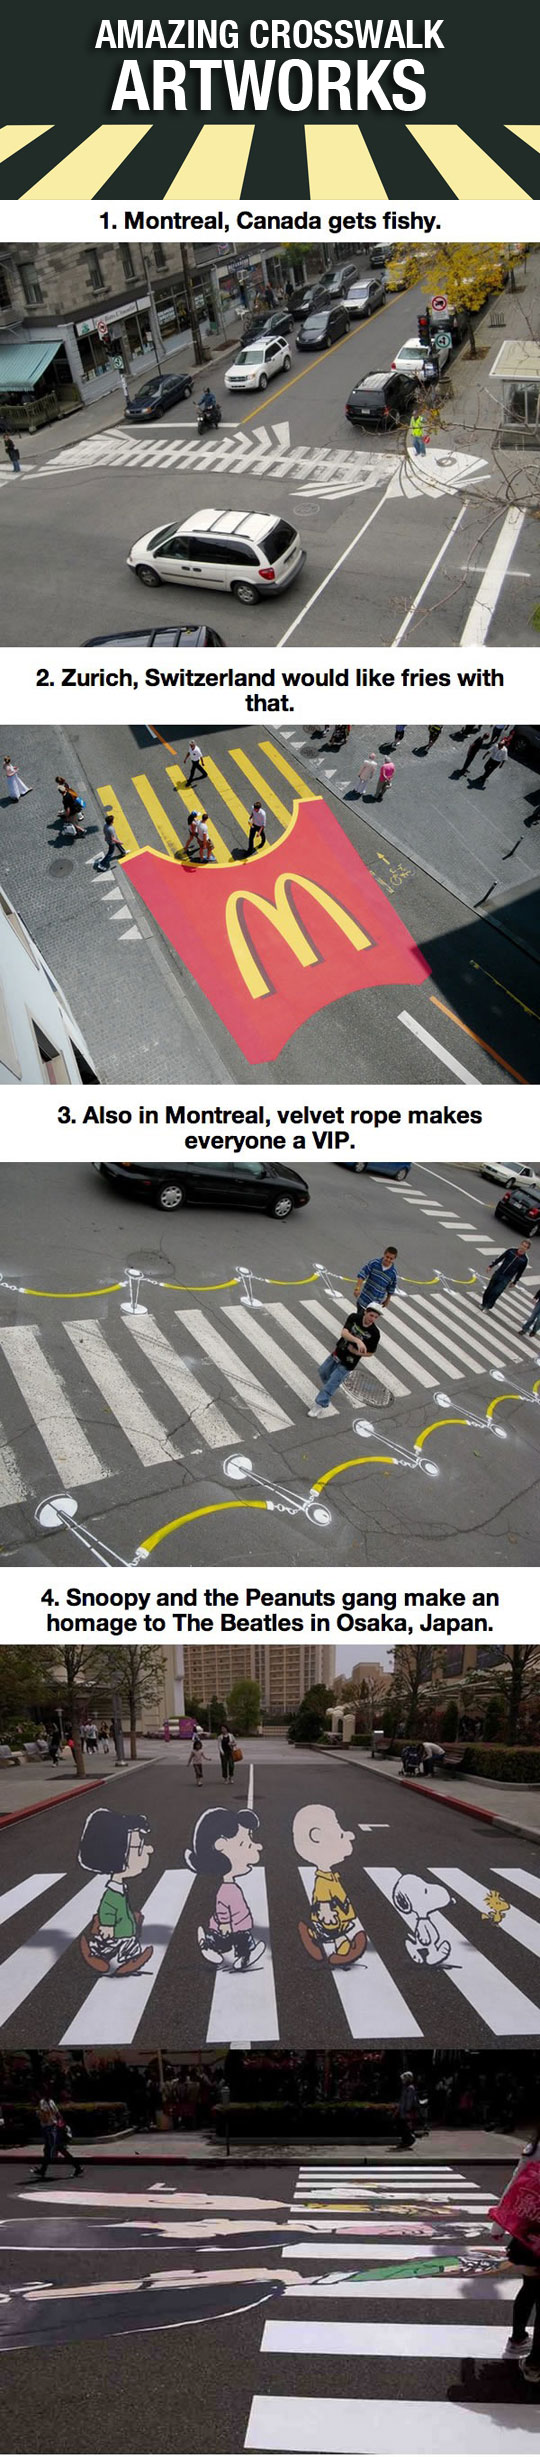 funny-street-crossing-artwork-colors-paint